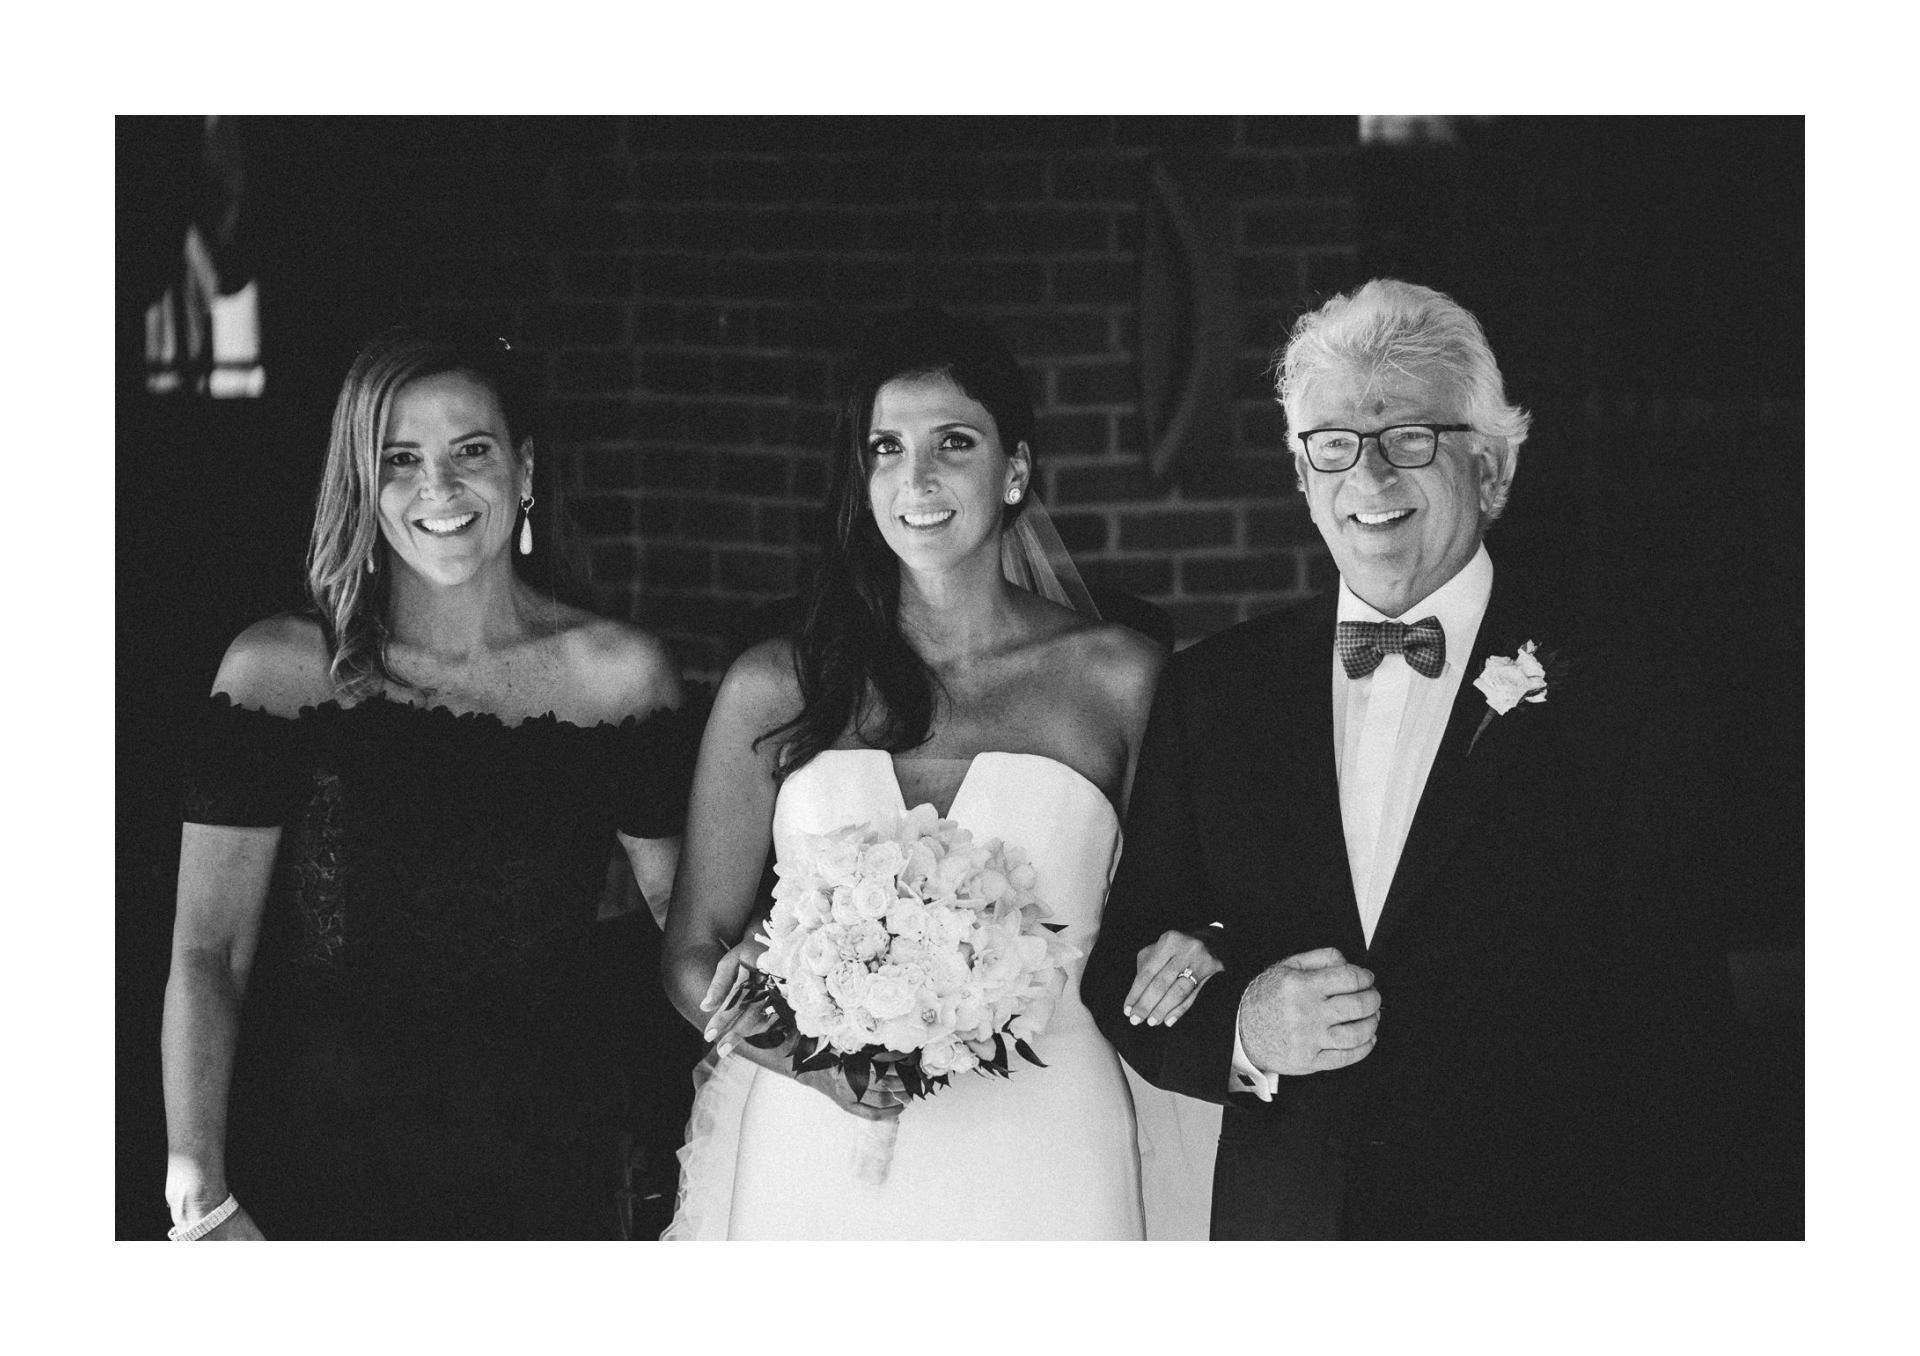 Beechmont Country Club Wedding Photographer in Beachwood 2 13.jpg